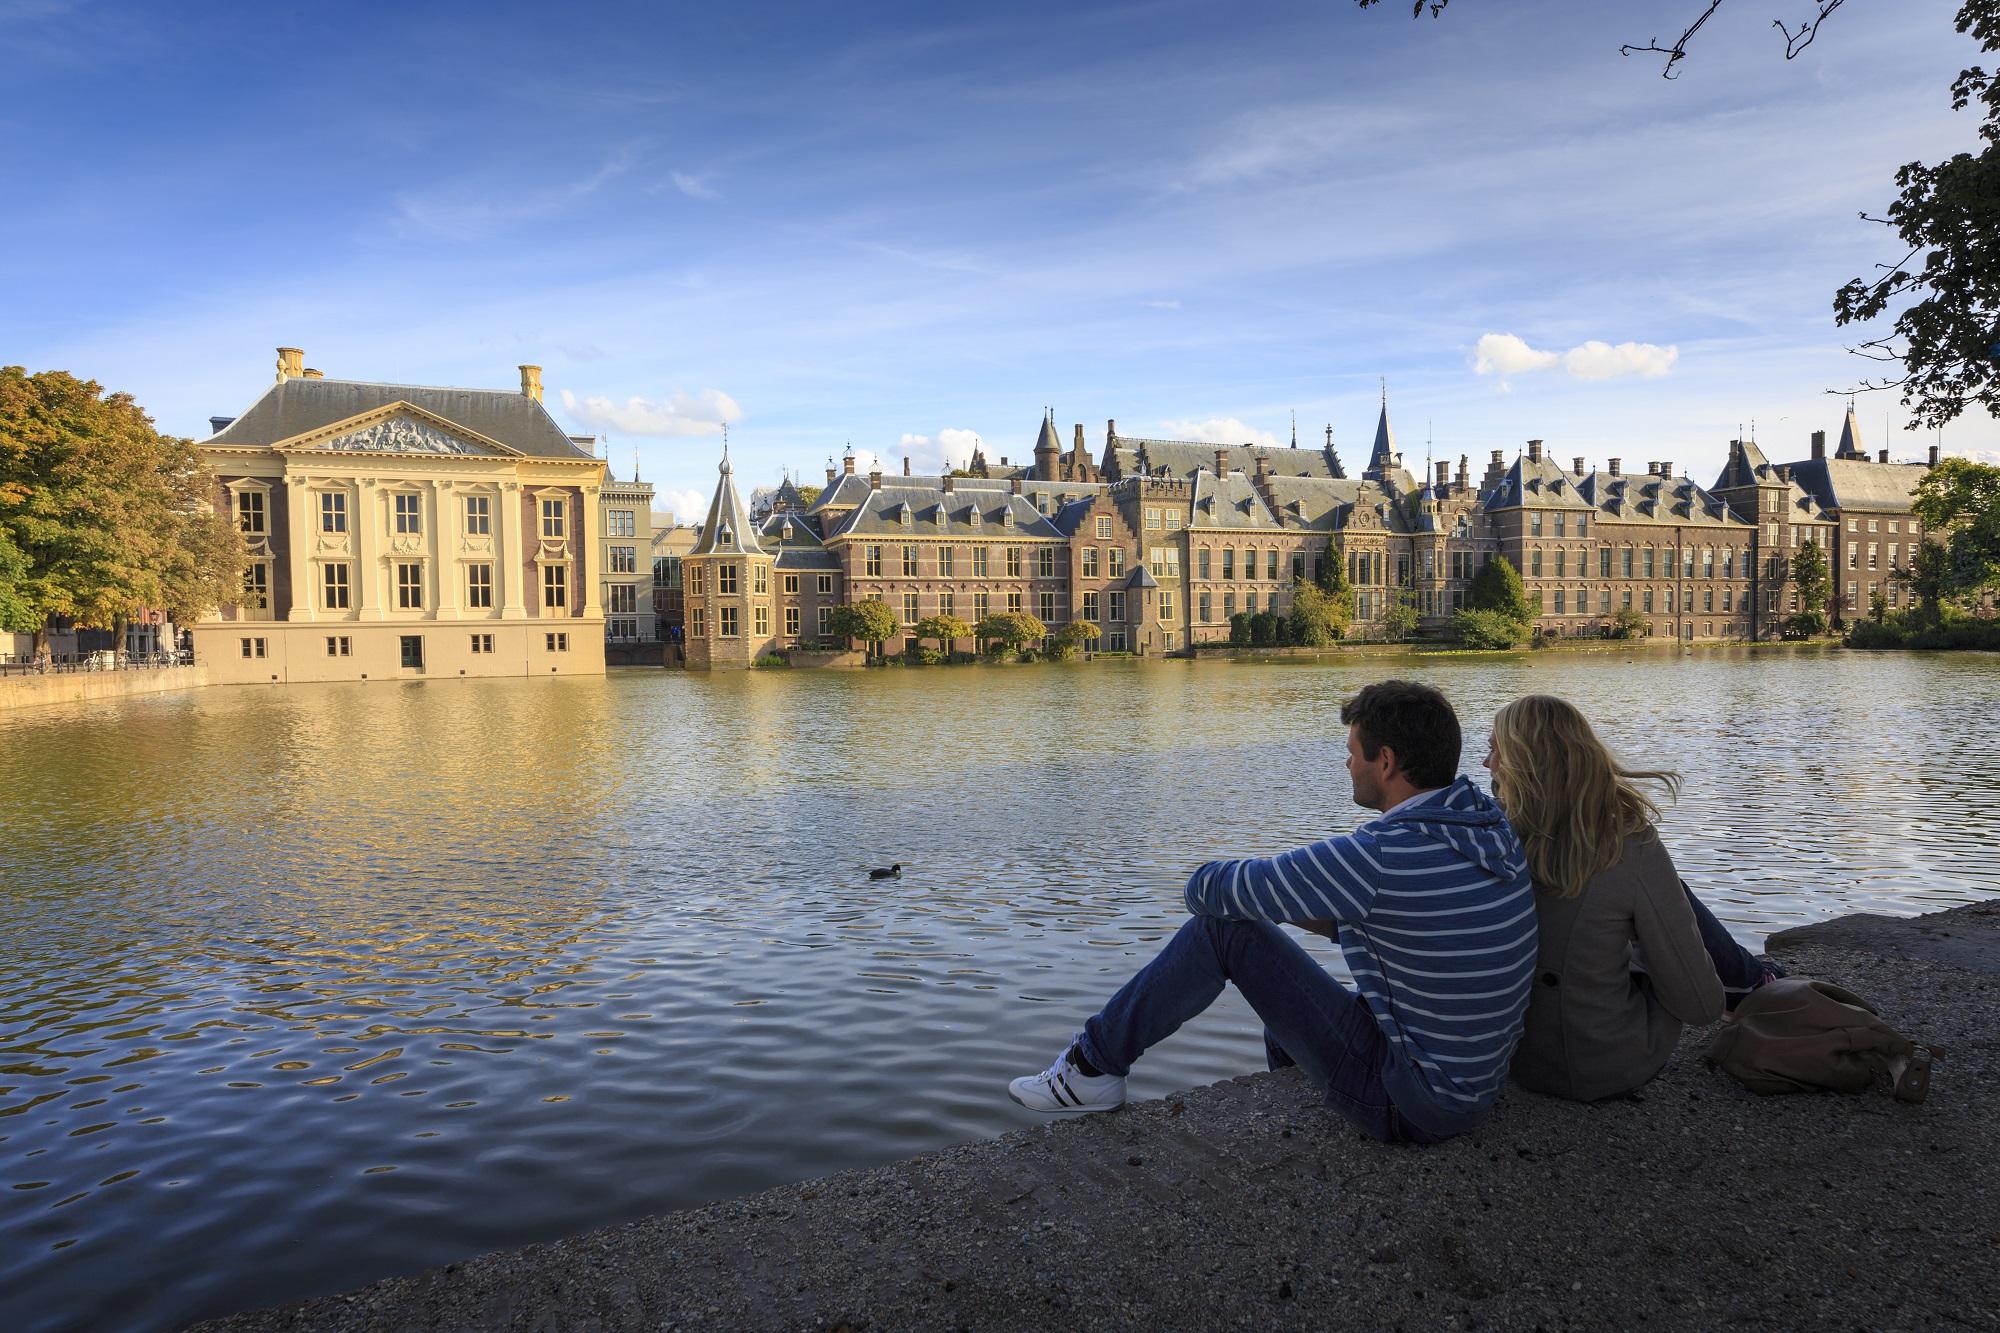 Netherlands, Den Haag. Binnenhof en Hofvijver